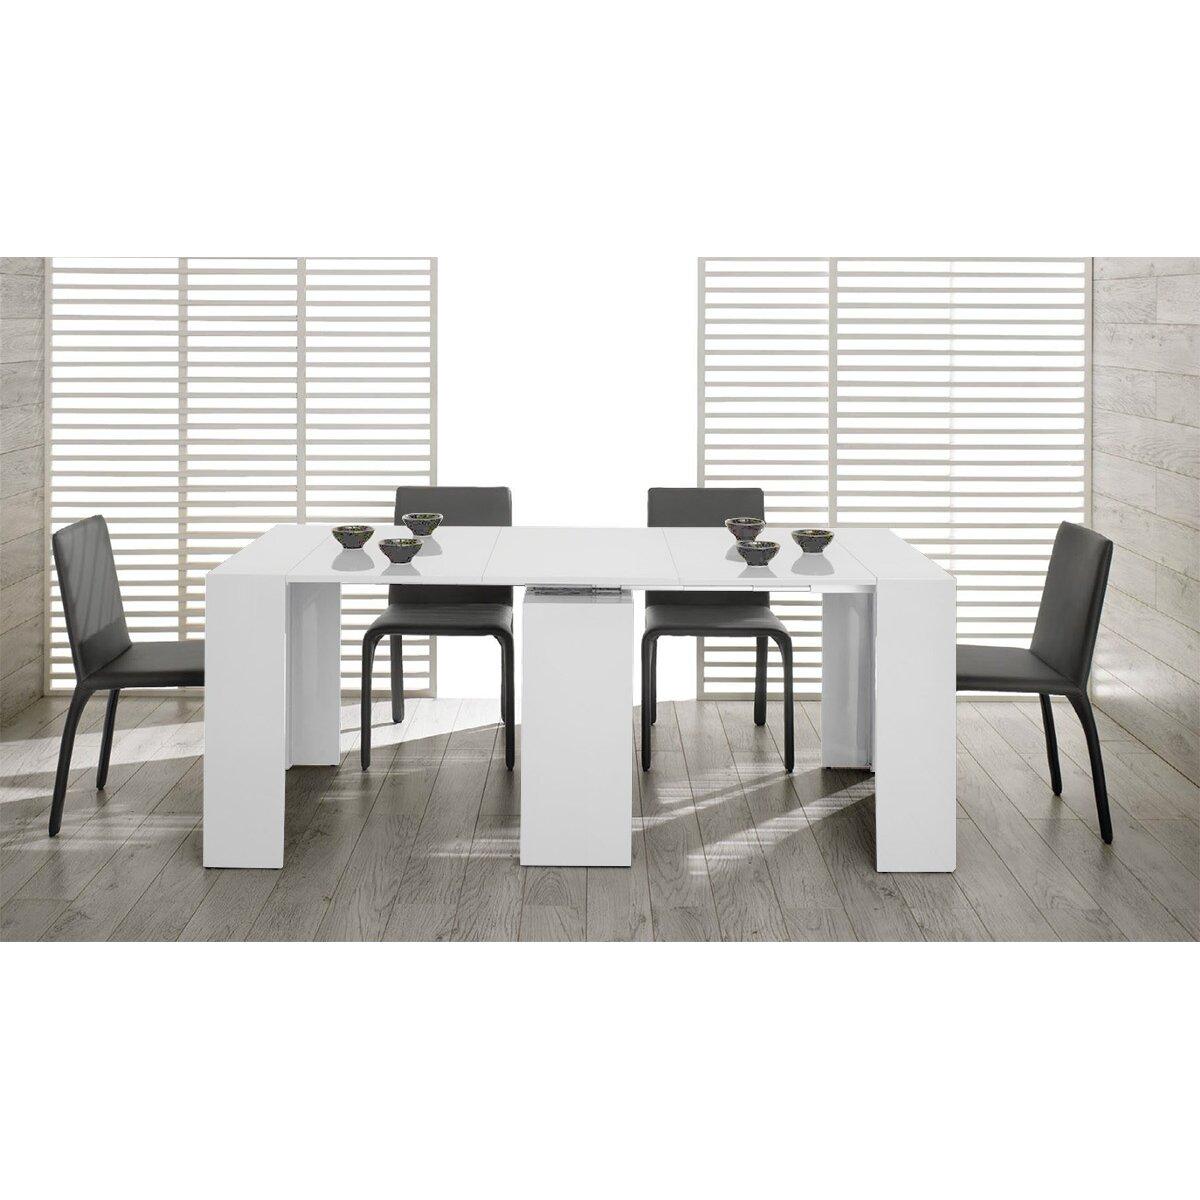 Vig Furniture Modrest Morph Ultra Compact Extendable Dining Table Reviews Wayfair